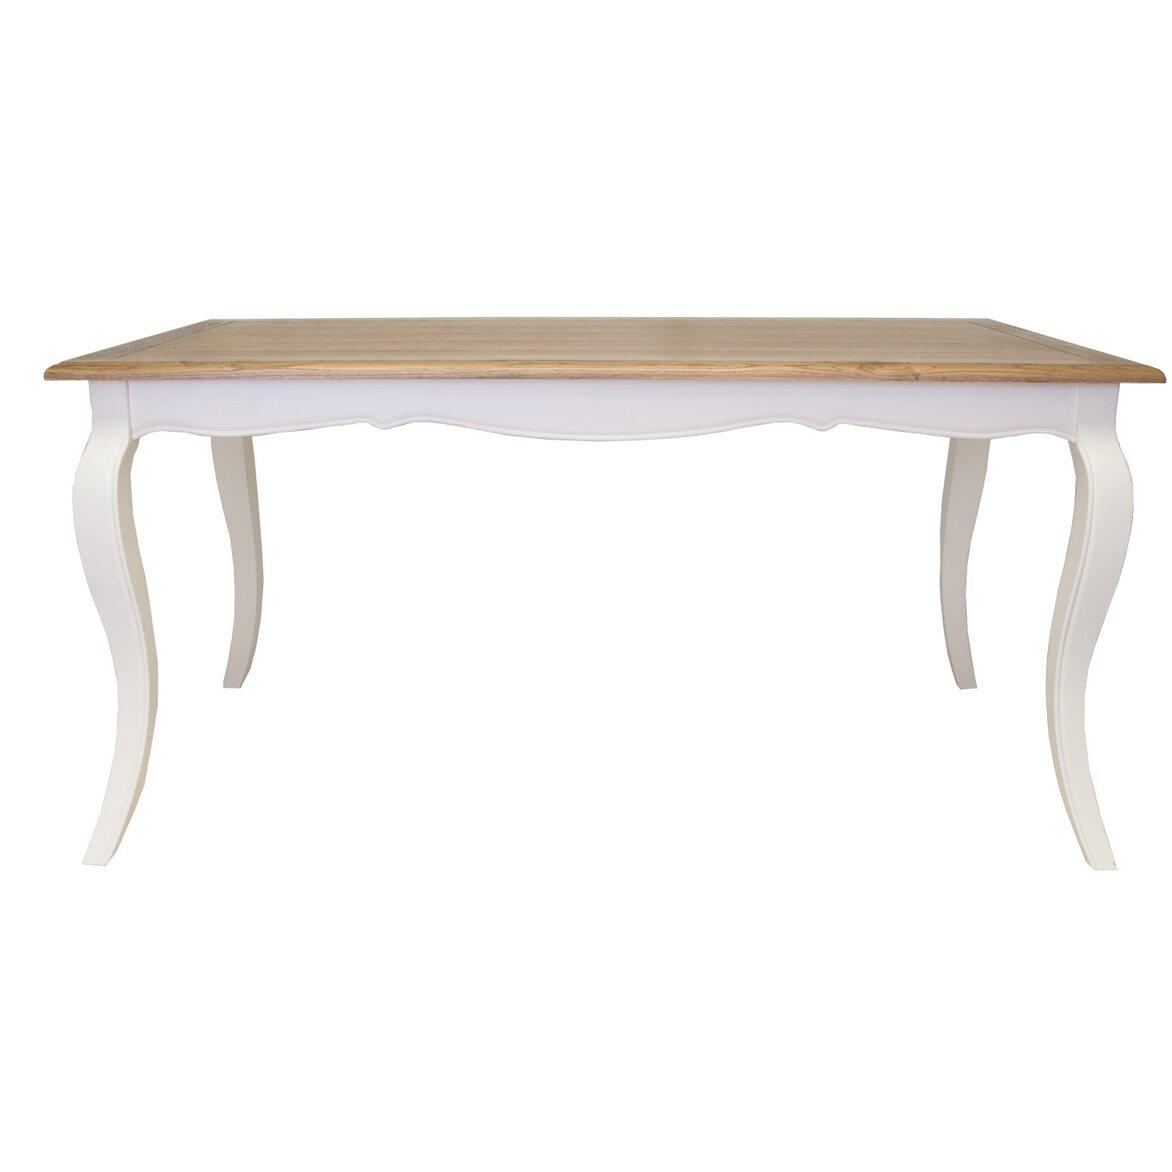 Обеденный стол Tulin | Обеденные столы Kingsby